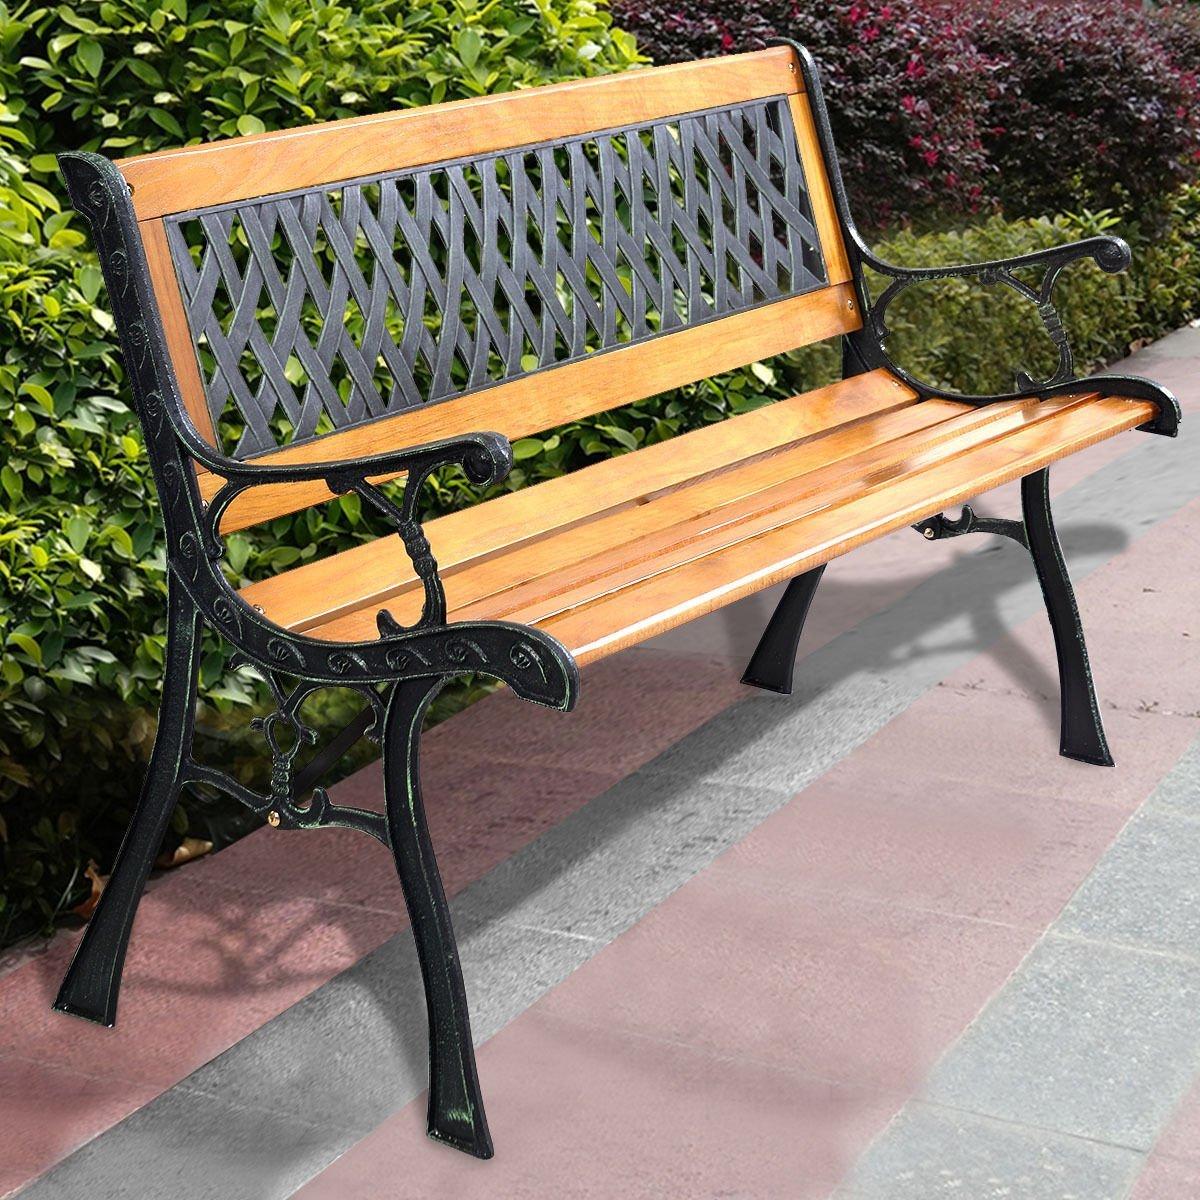 49 1/2'' Patio Park Garden Bench Porch Path Chair Outdoor Deck Cast Iron Hardwood